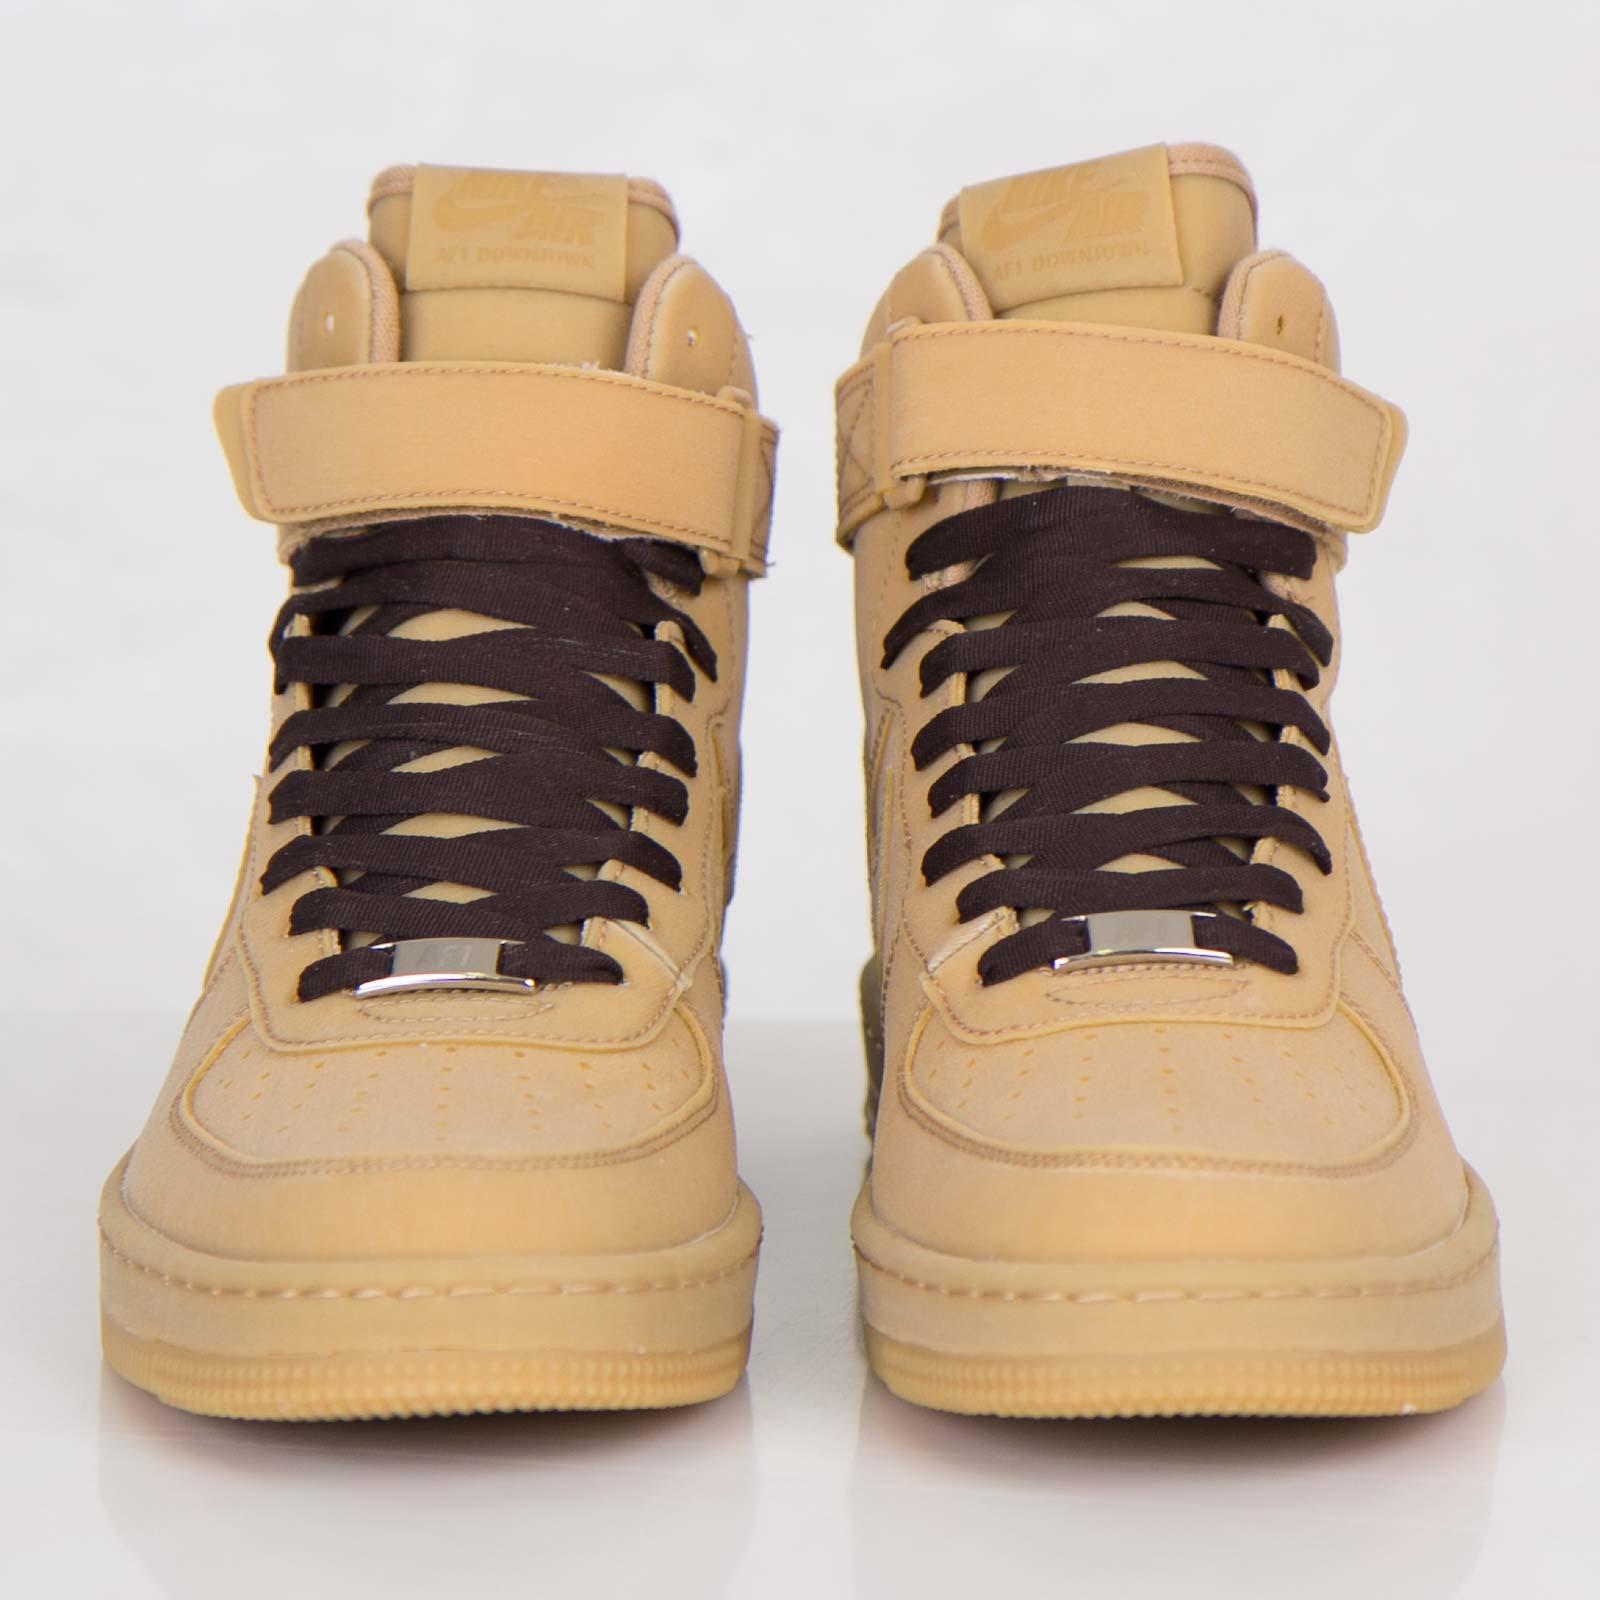 competitive price de7d6 07b0f Nike Air Force 1 Downtown Hi Gum LW QS - 638140-900 - Sneakersnstuff    sneakers   streetwear online since 1999